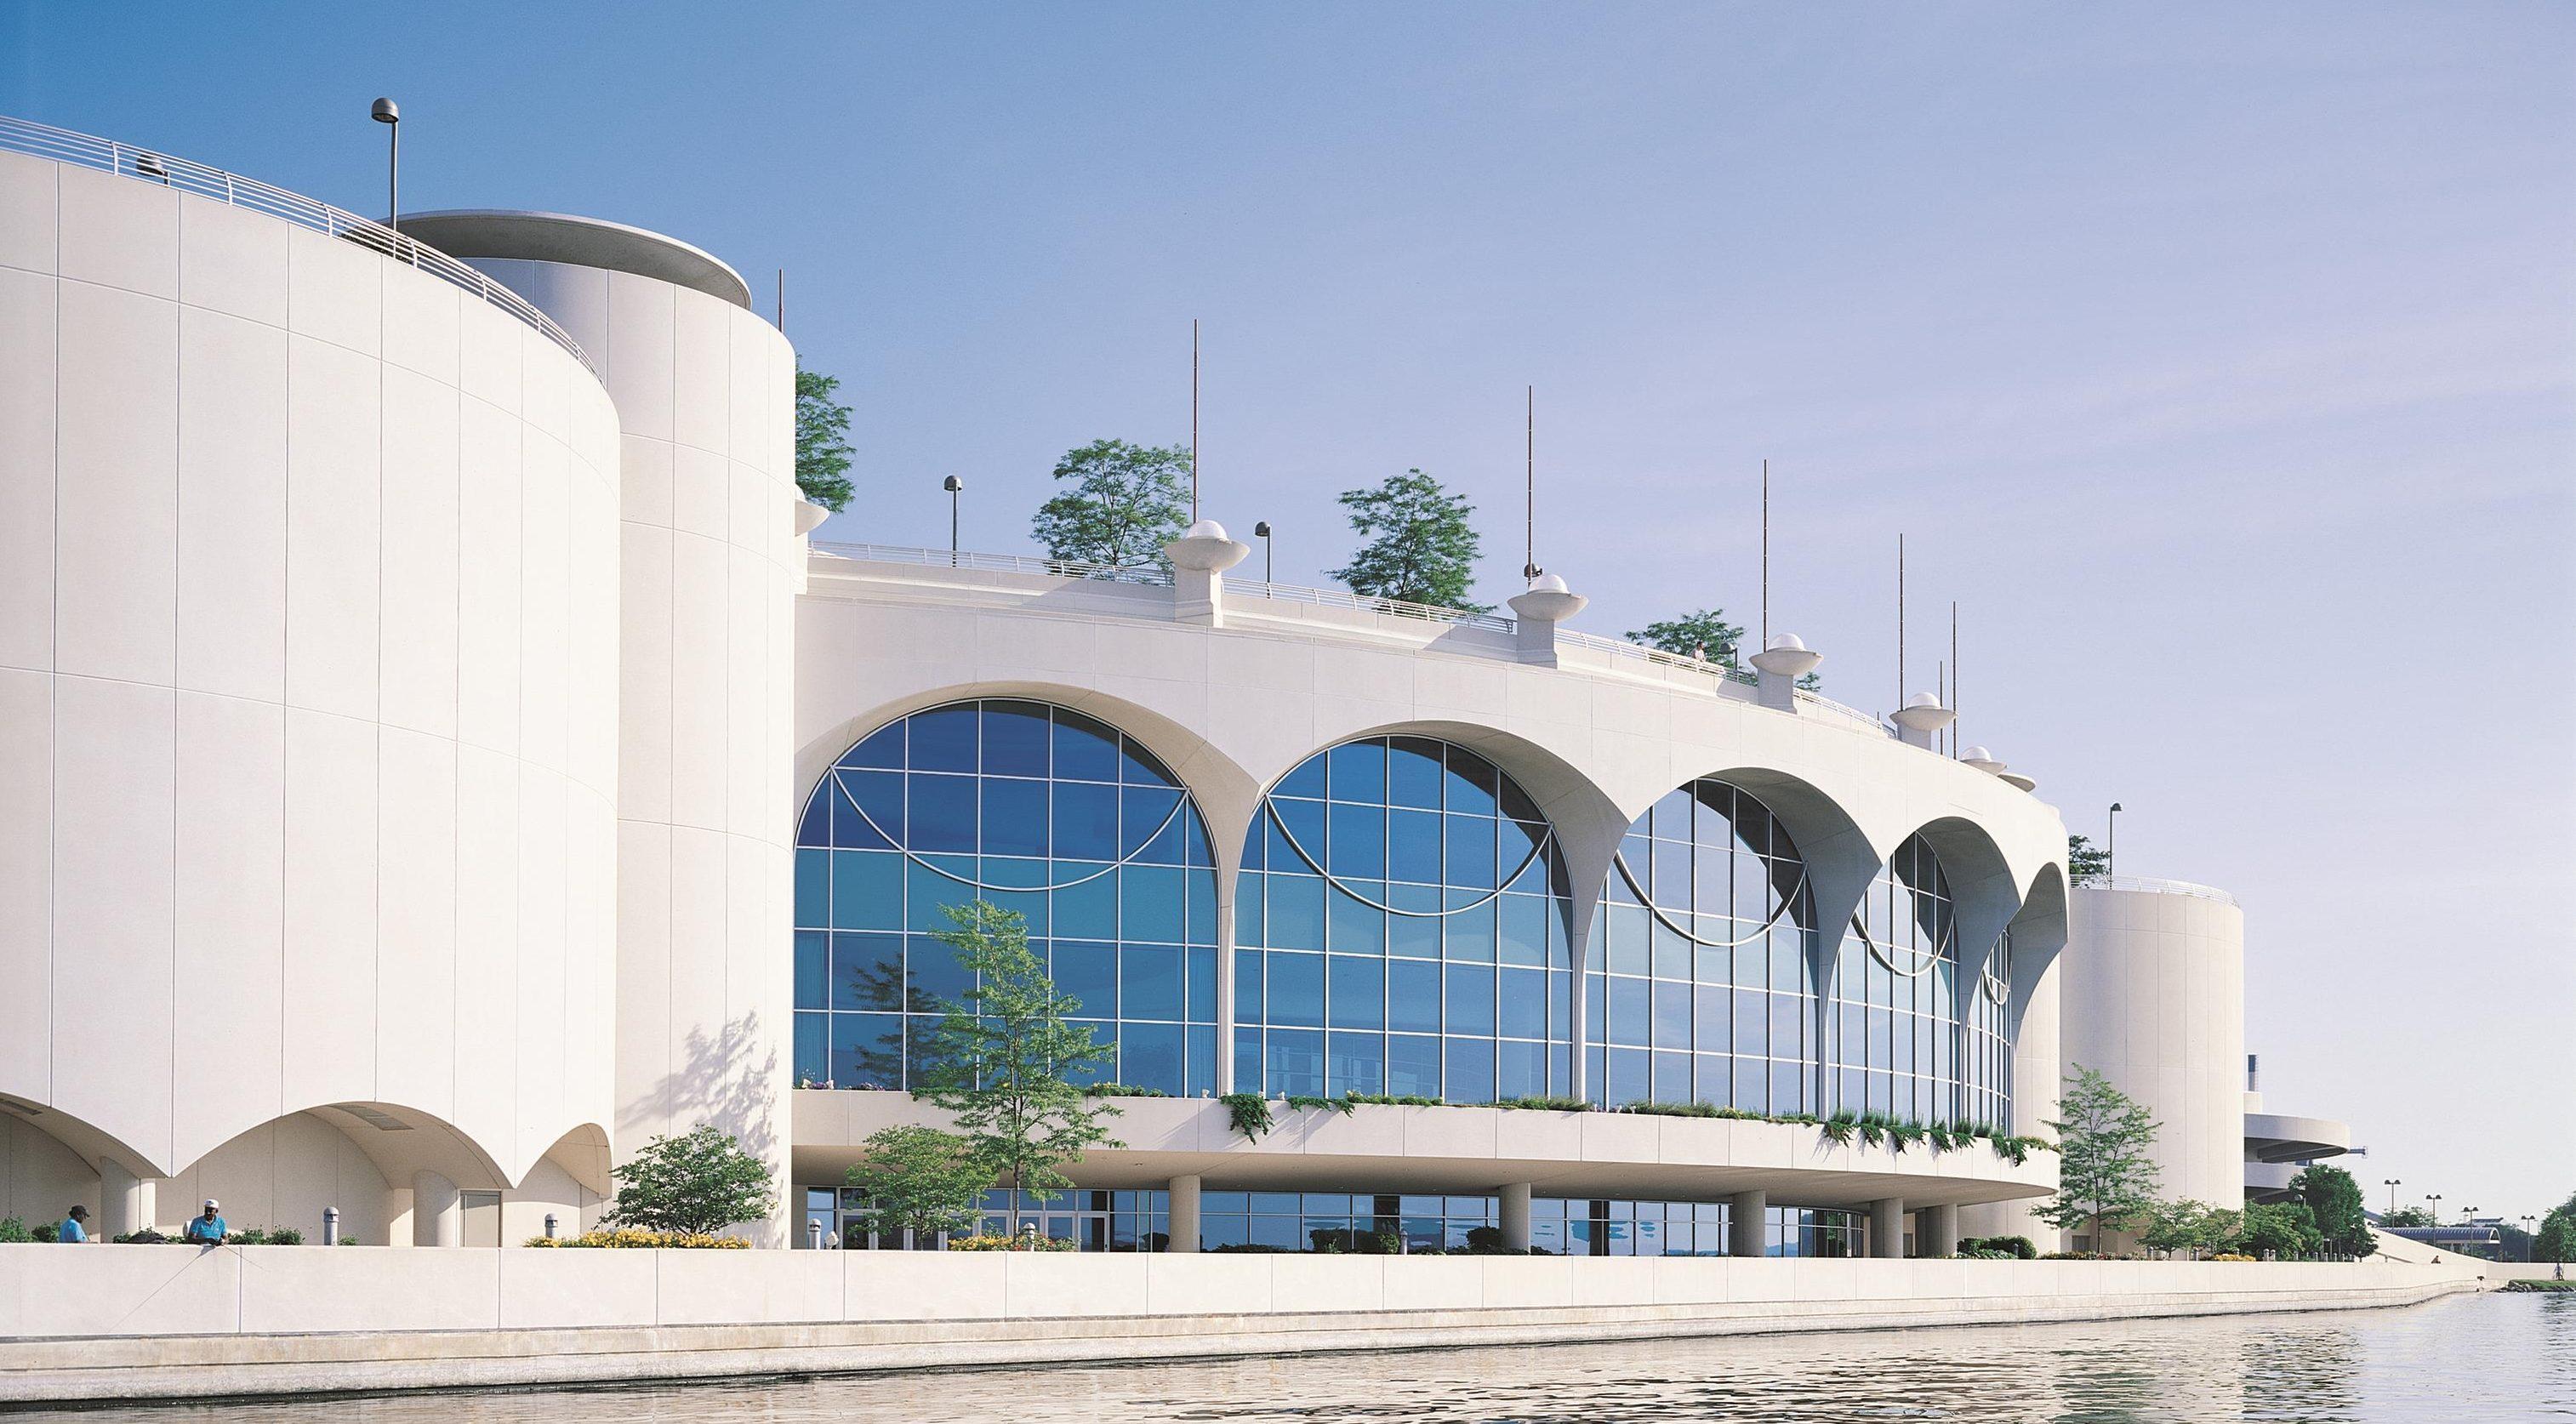 Monona Terrace - Frank Lloyd Wright